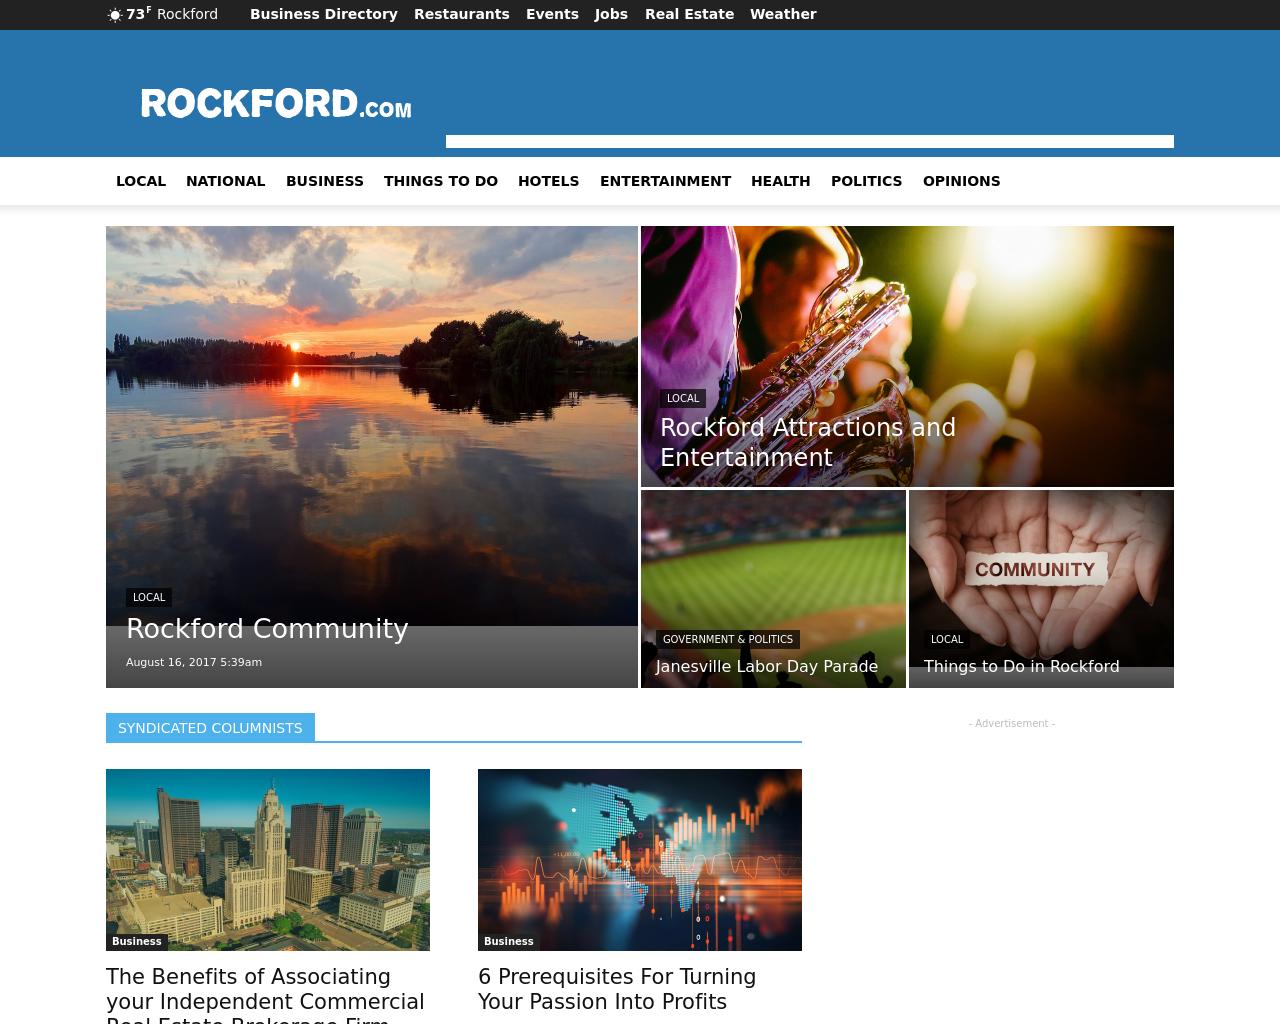 Rockford.com-Advertising-Reviews-Pricing